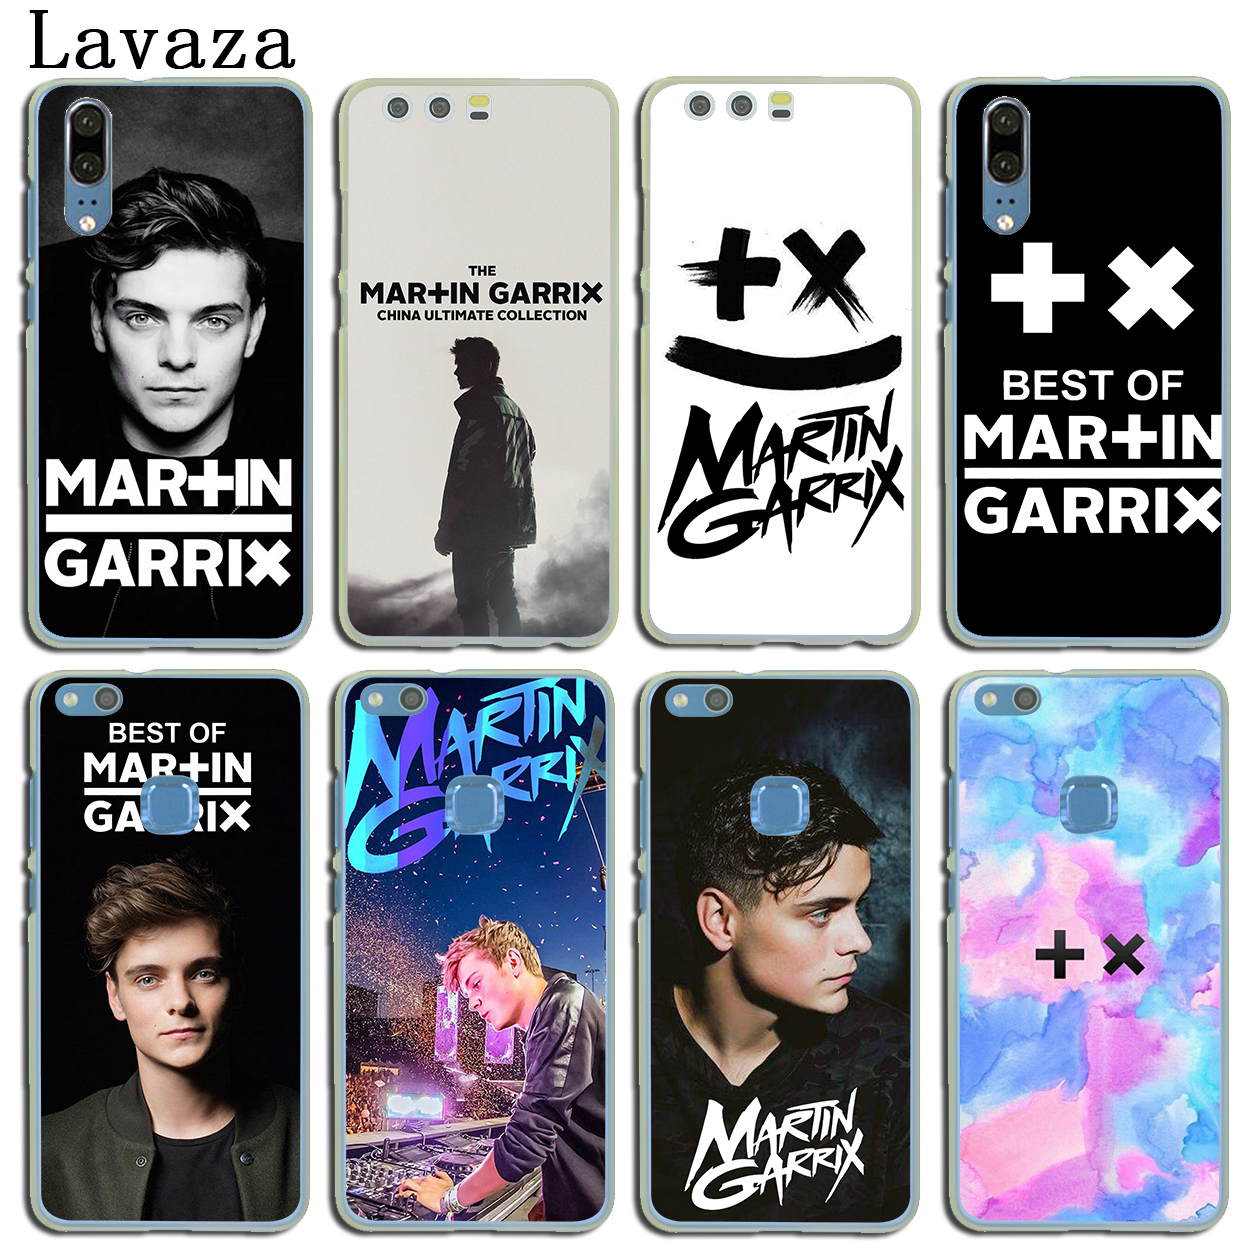 Lavaza Martin Garrix DJ Hard Cover Case for Huawei P20 P10 P9 Plus P8 Lite Mini 2015 2016 2017 P Smart Mate 9 10 Lite Pro Case